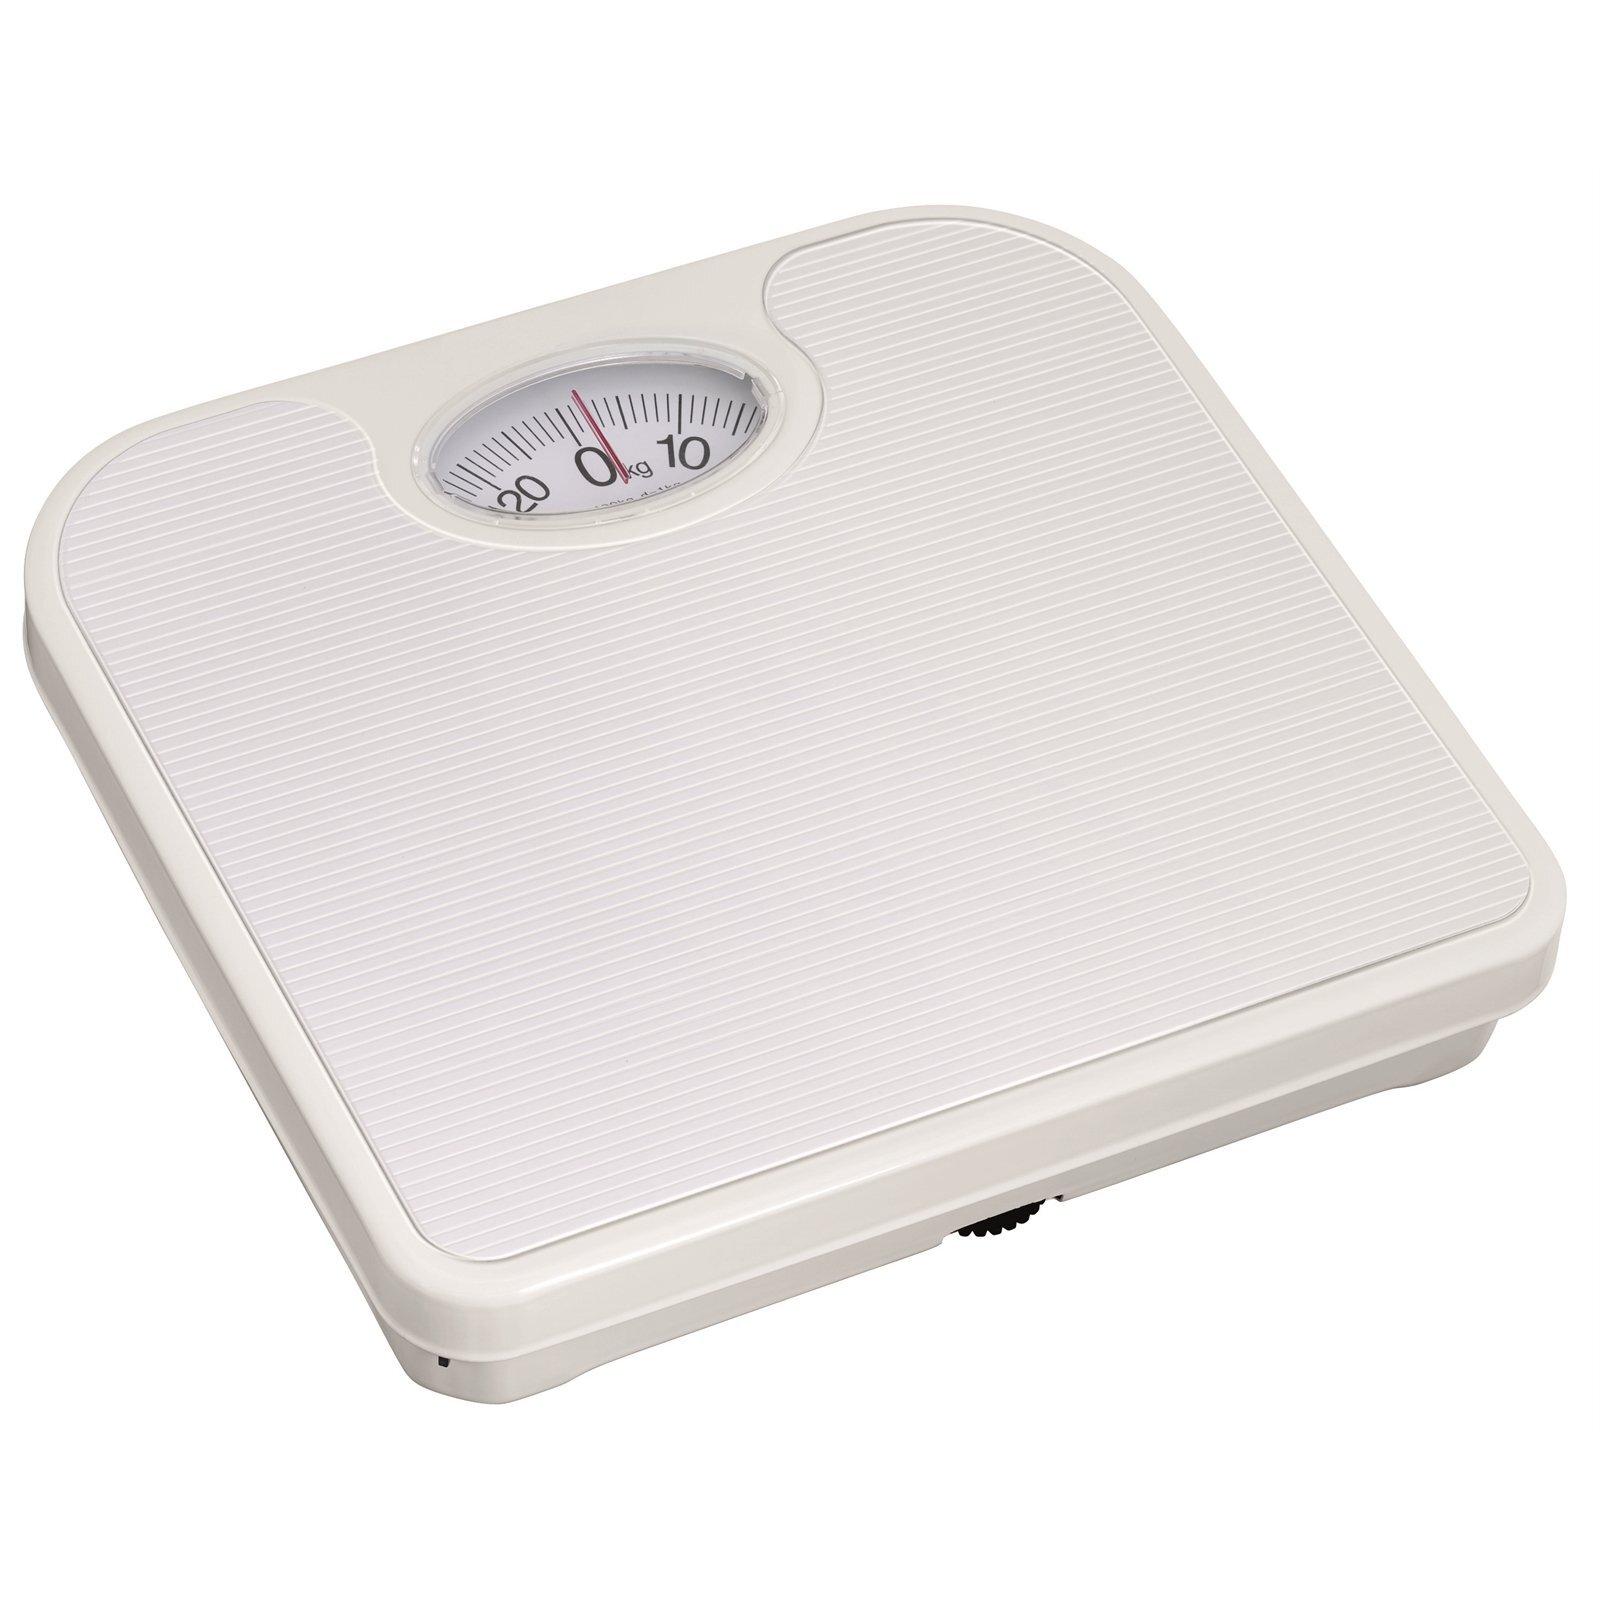 Easyweigh 130kg Mechanical Bathroom Scales